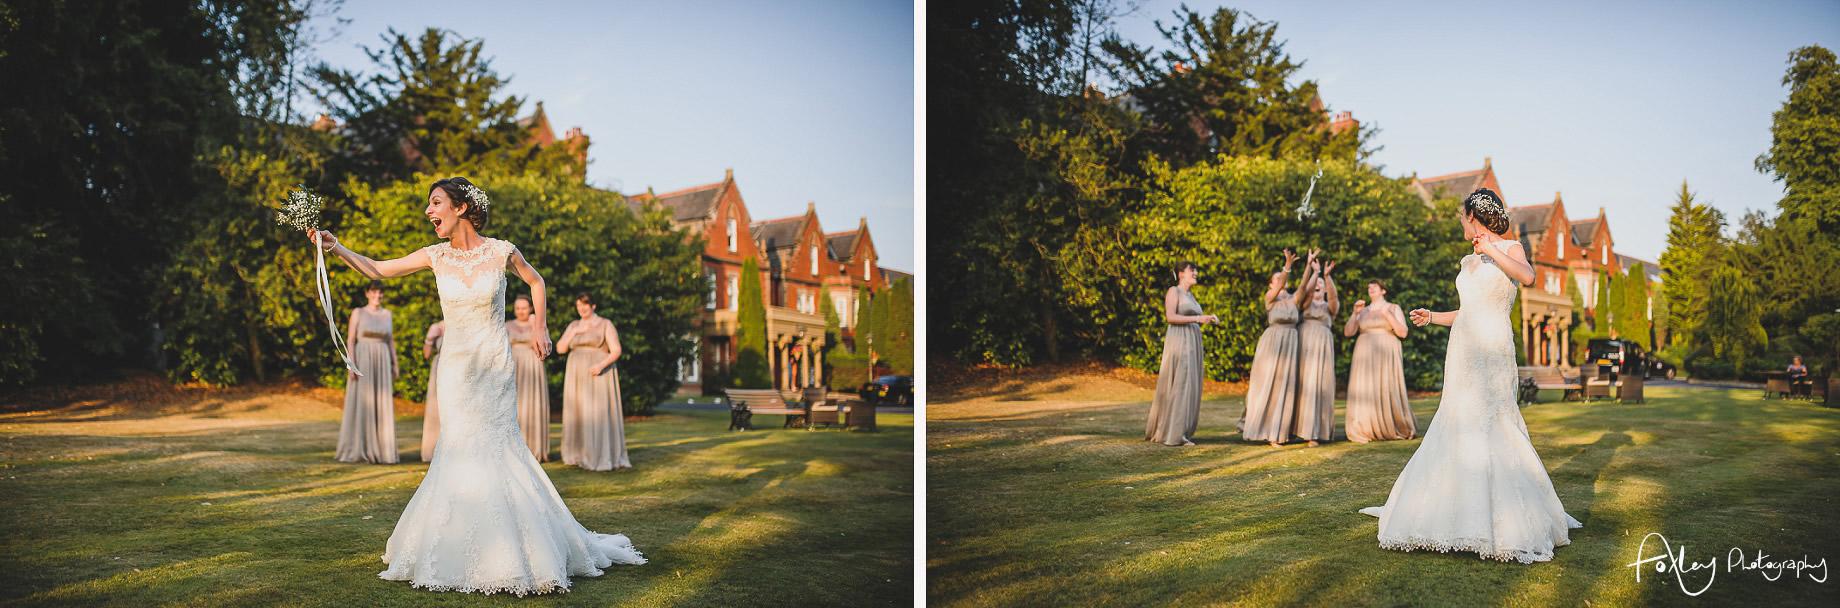 Rebecca and Dan Wedding at Preston Marriott Hotel 141